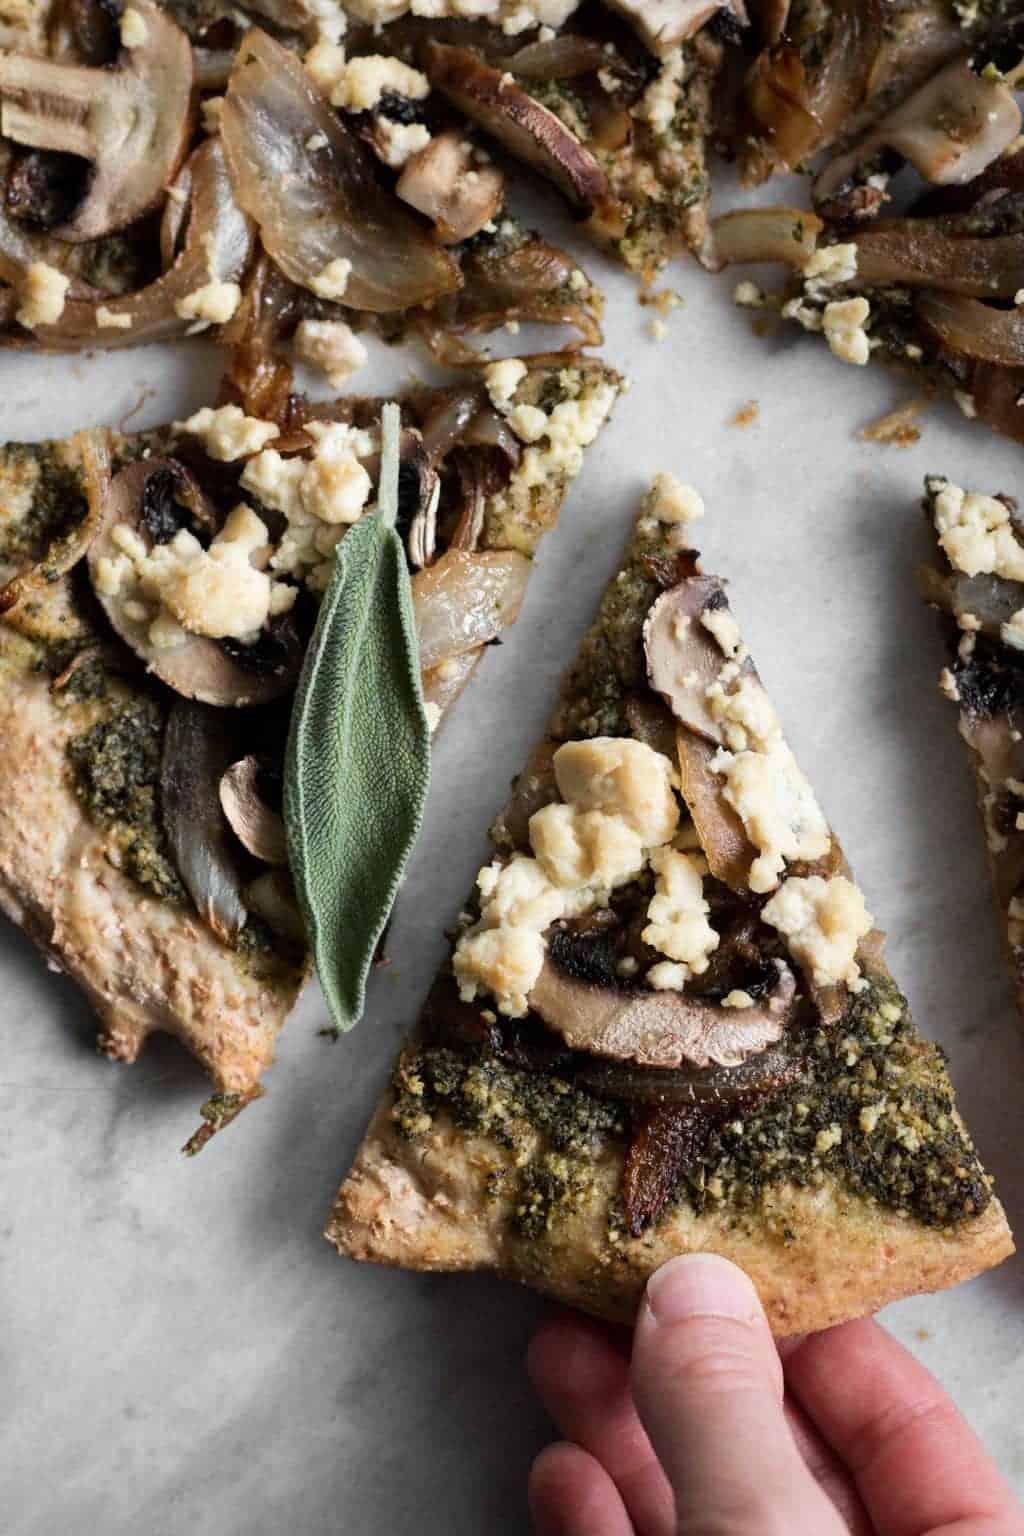 Mushroom & Caramelized Onion Pizza with Sage Pesto